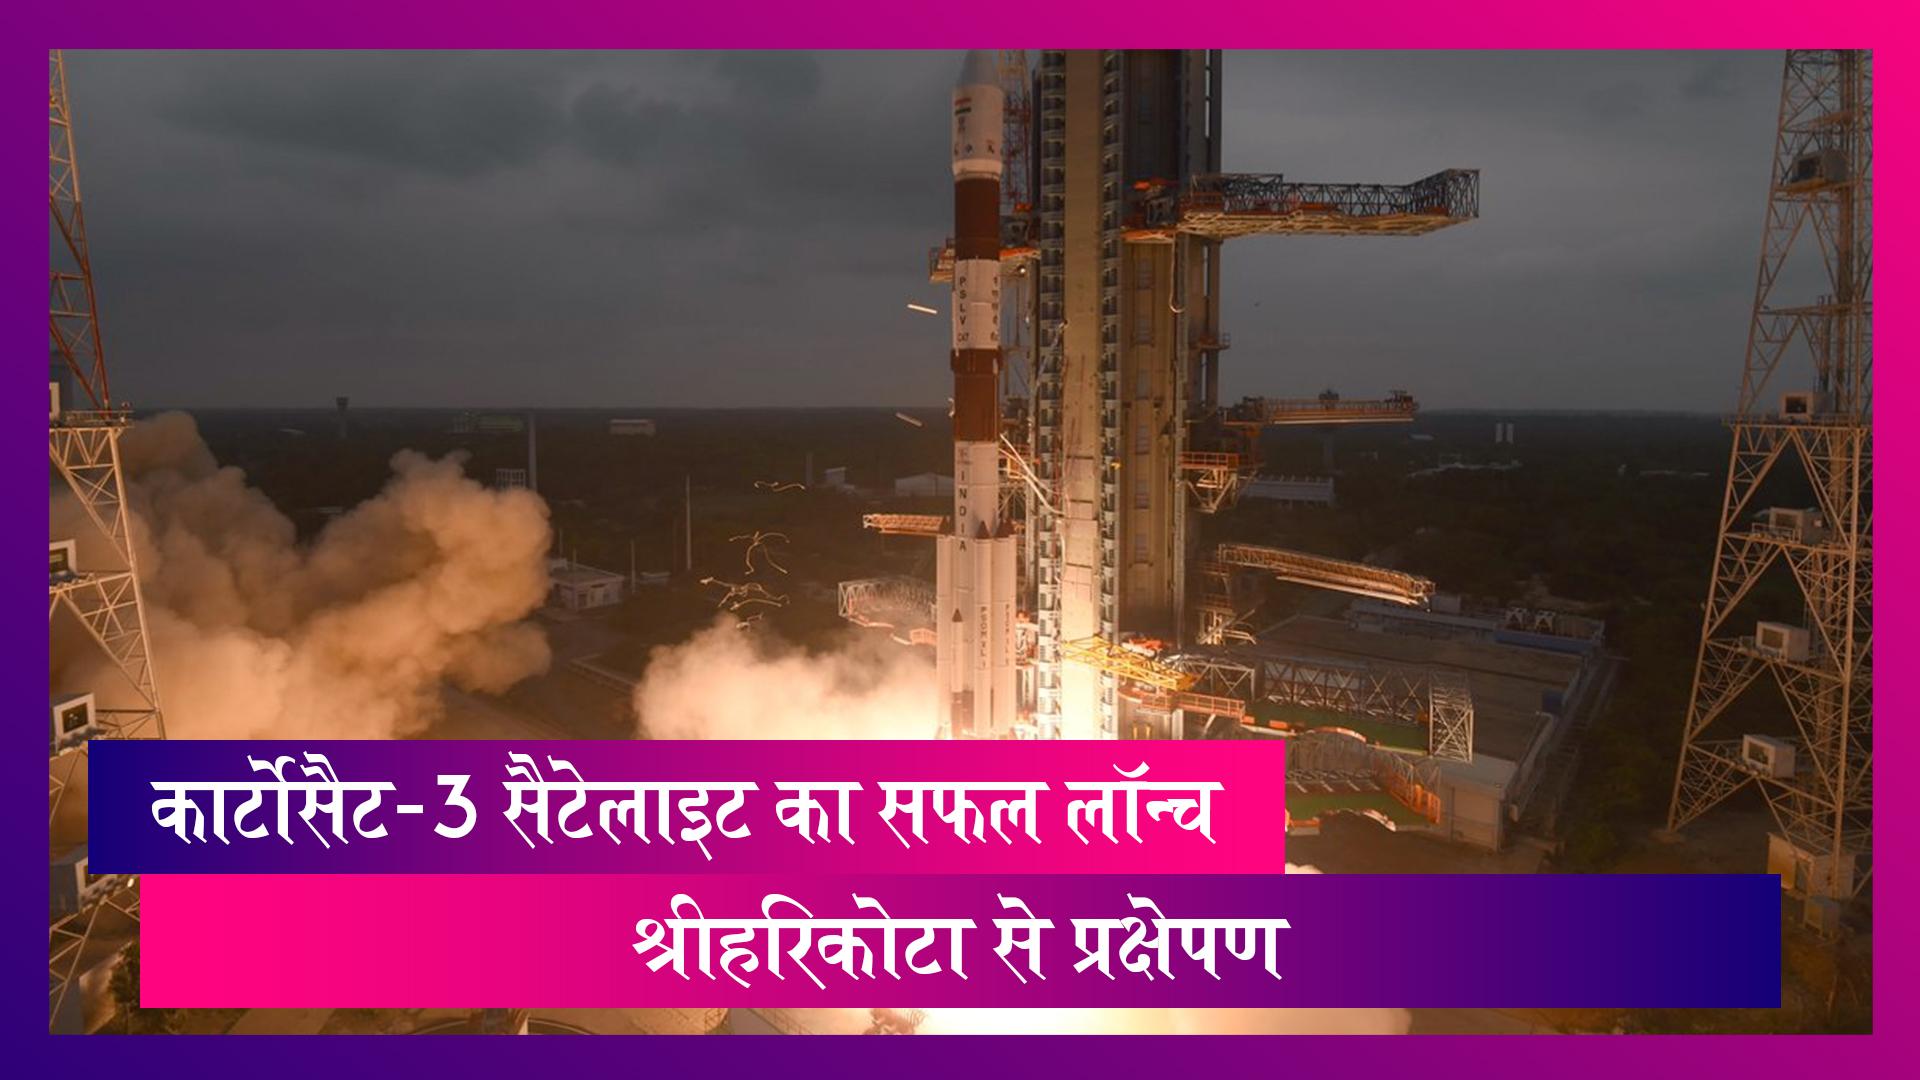 ISRO CARTOSAT-3 Launch: ISRO ने रचा इतिहास, Cartosat-3 का सफलतापूर्वक लॉन्च